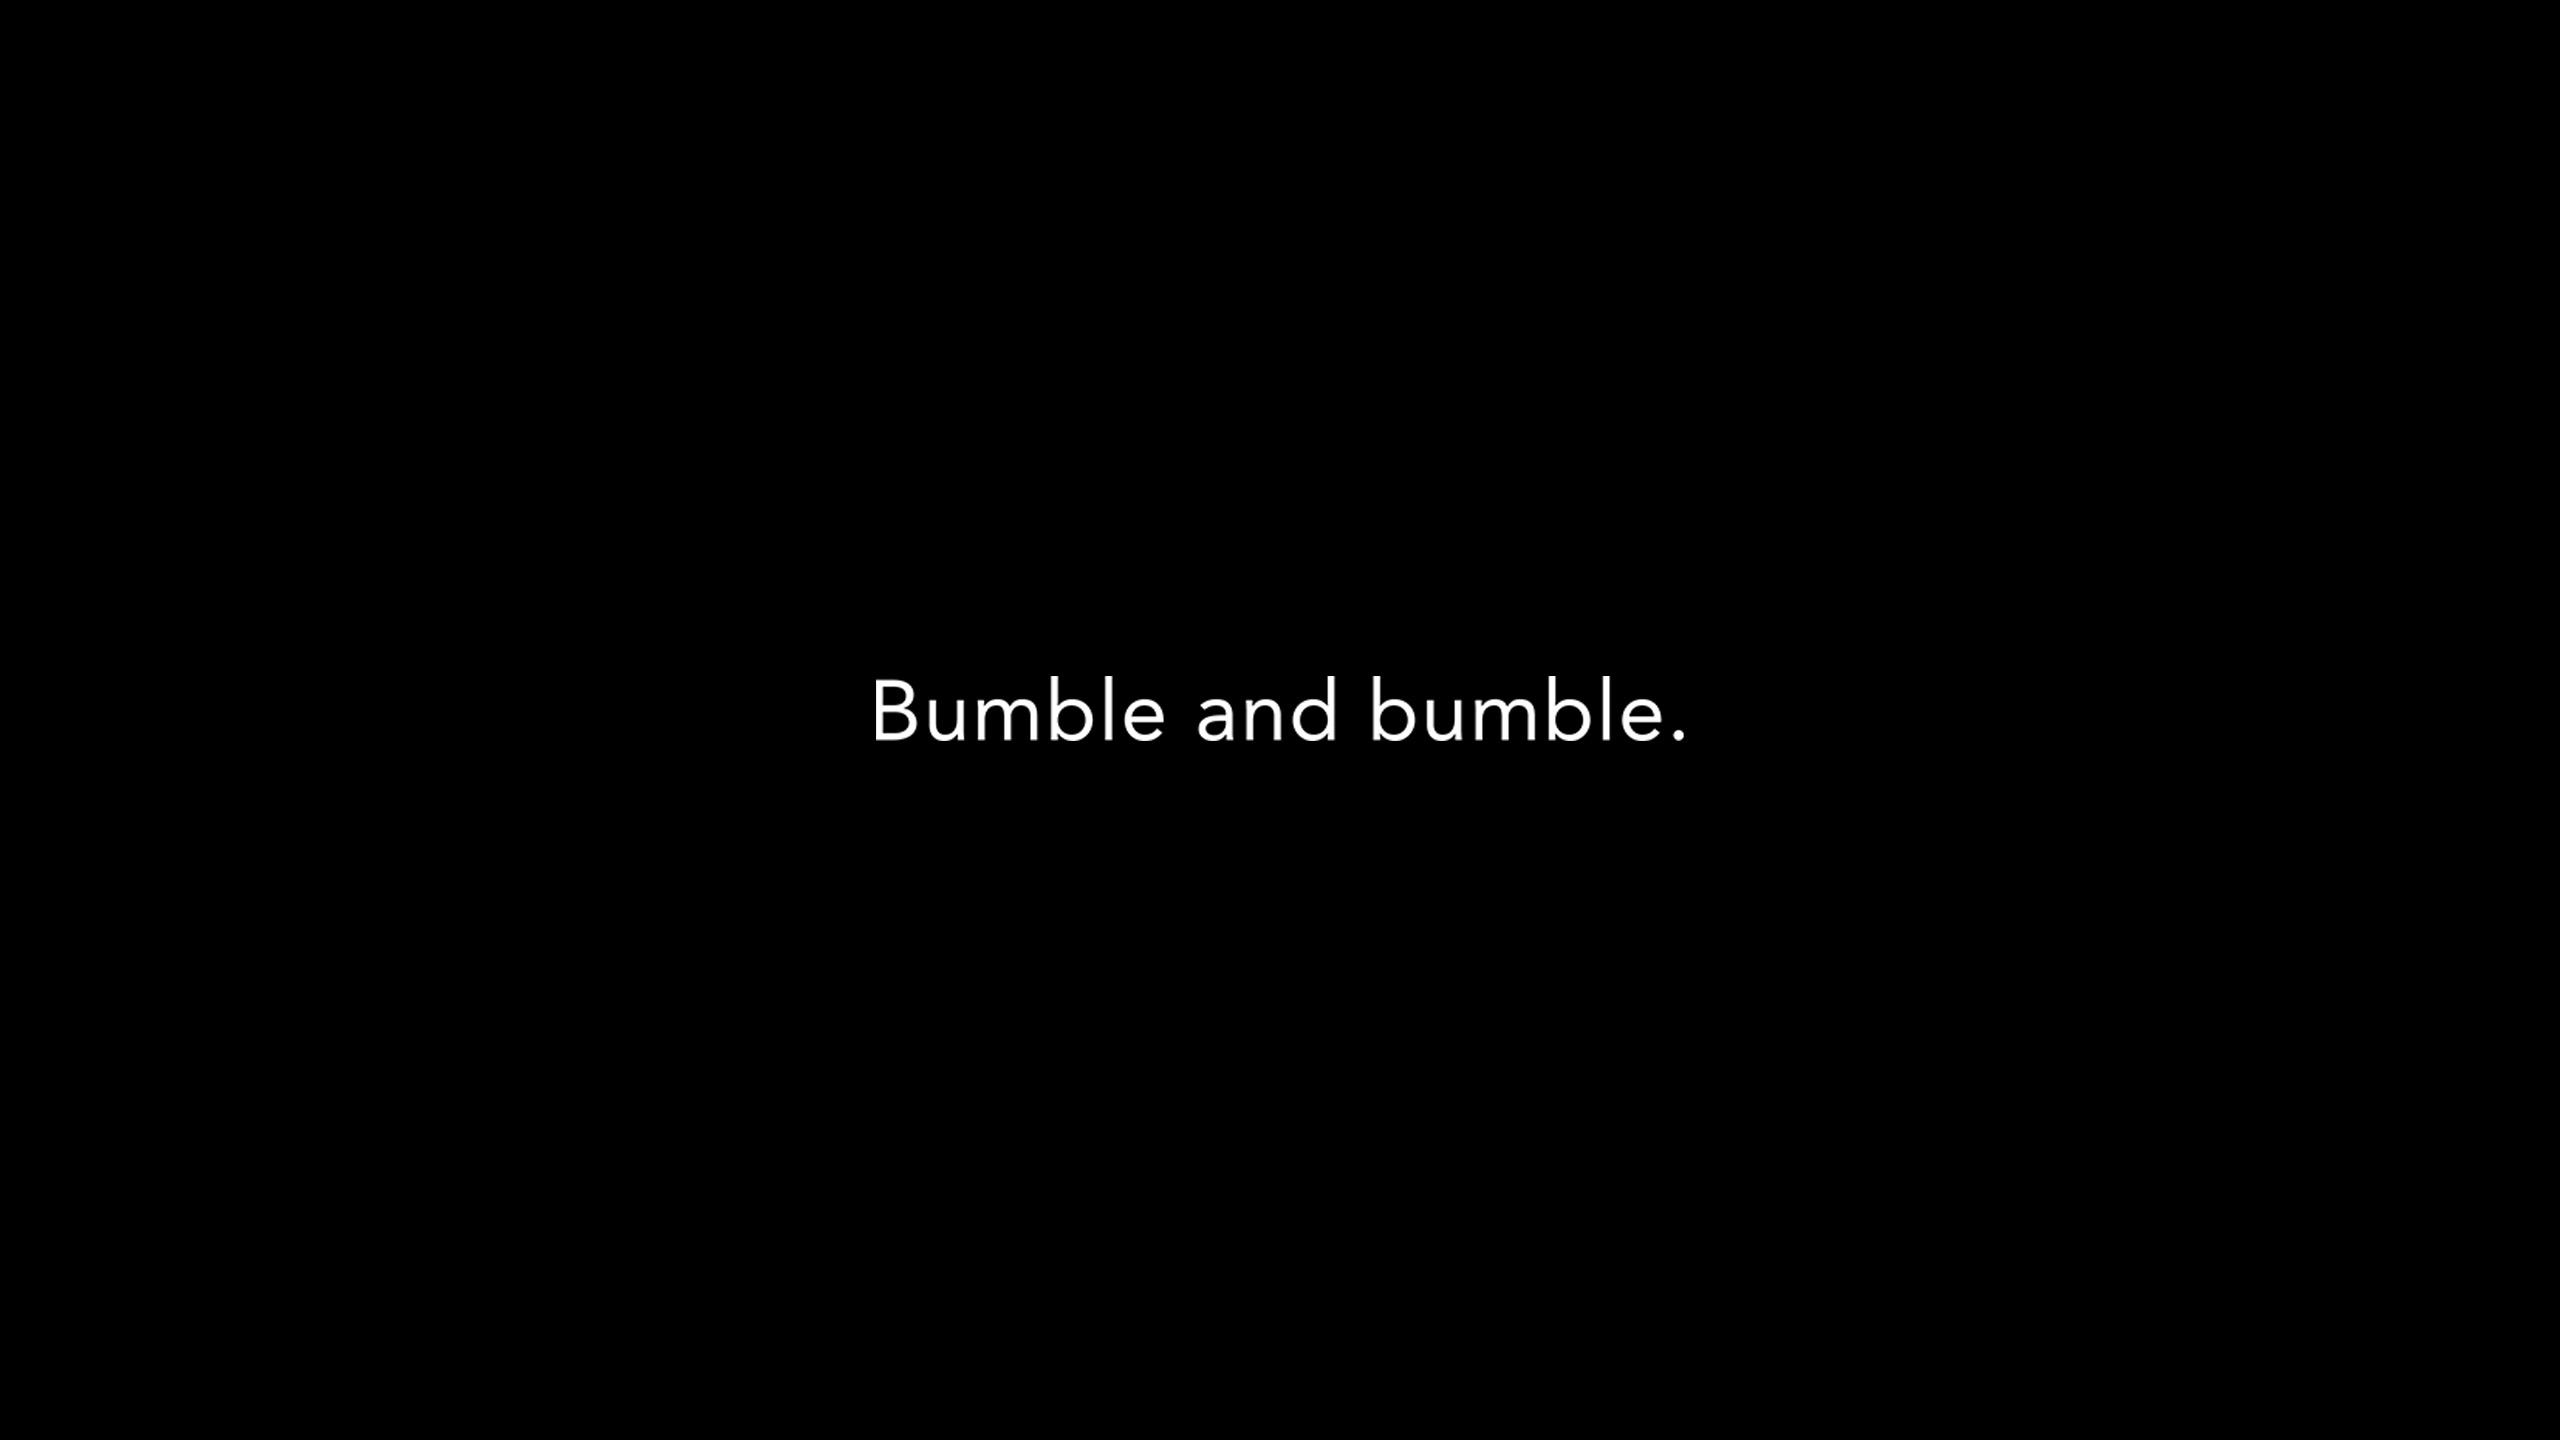 Bumble and bumble seeking Hair Models!